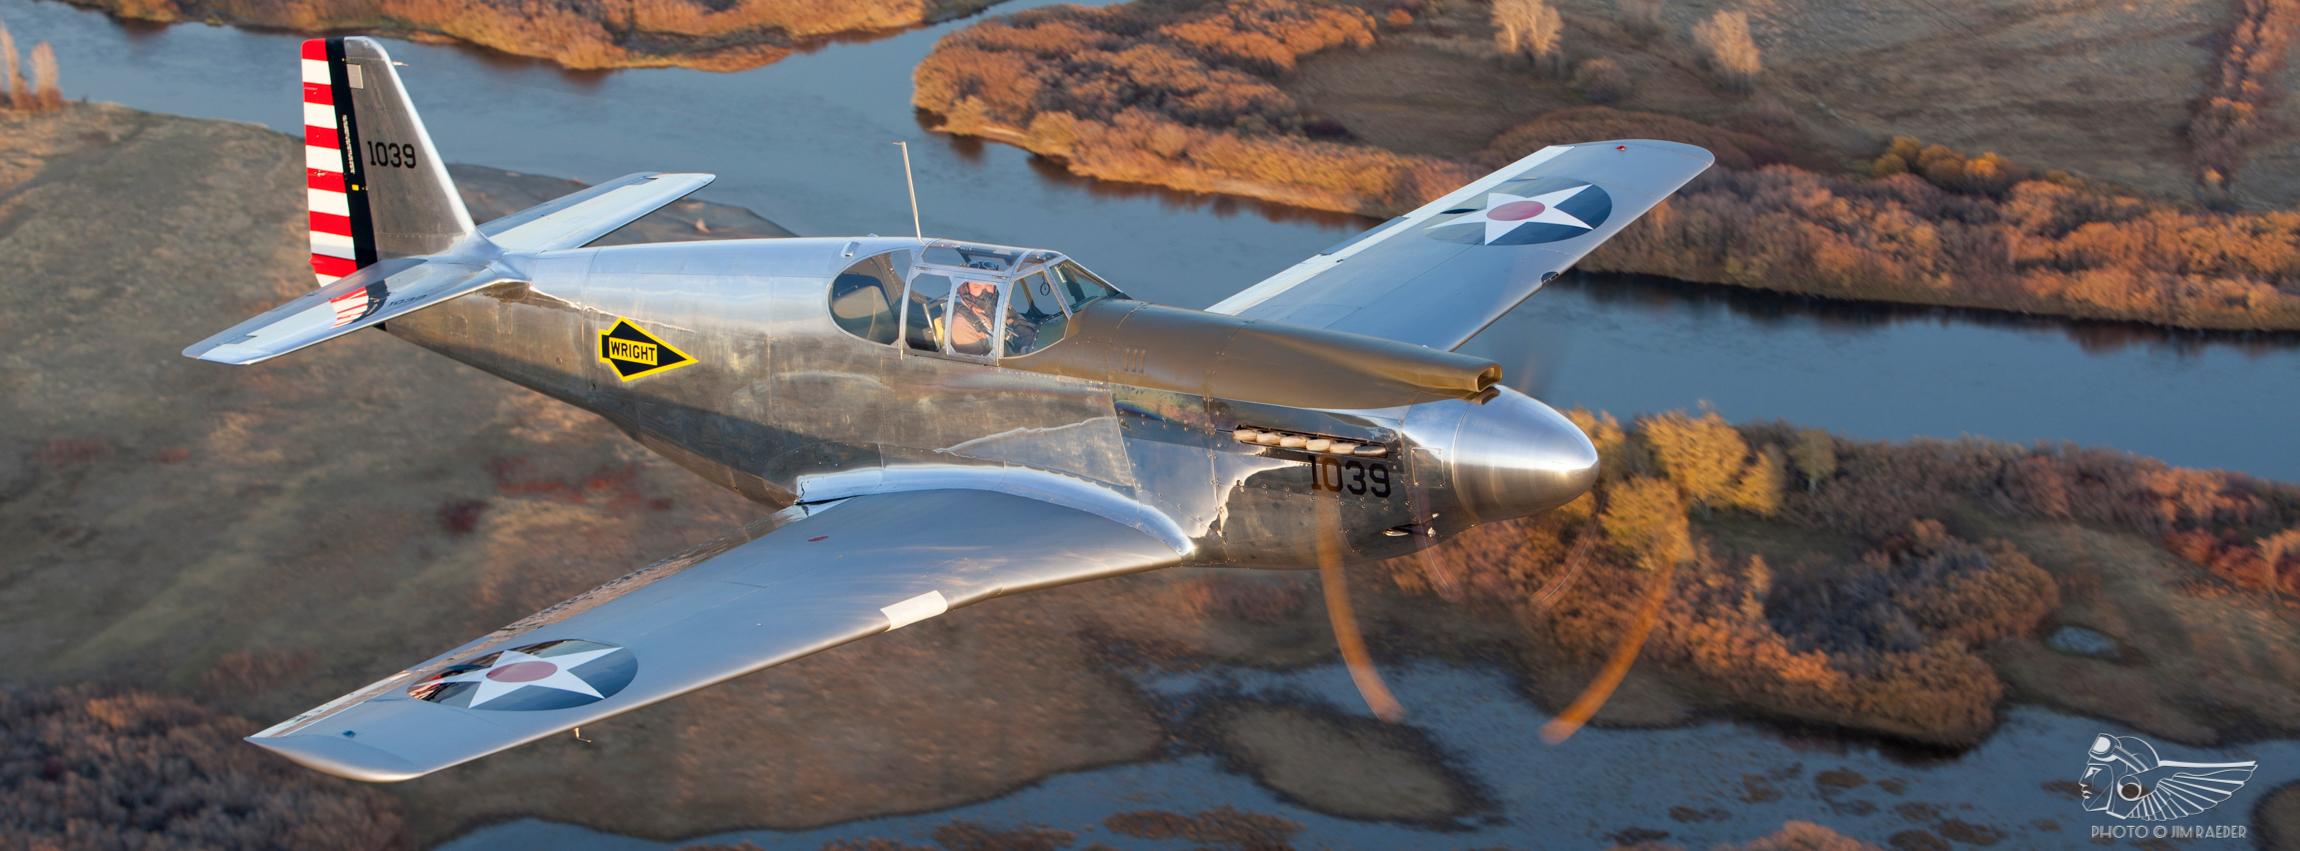 Restoration to Reno: John Muszala II on the XP-51 Mustang